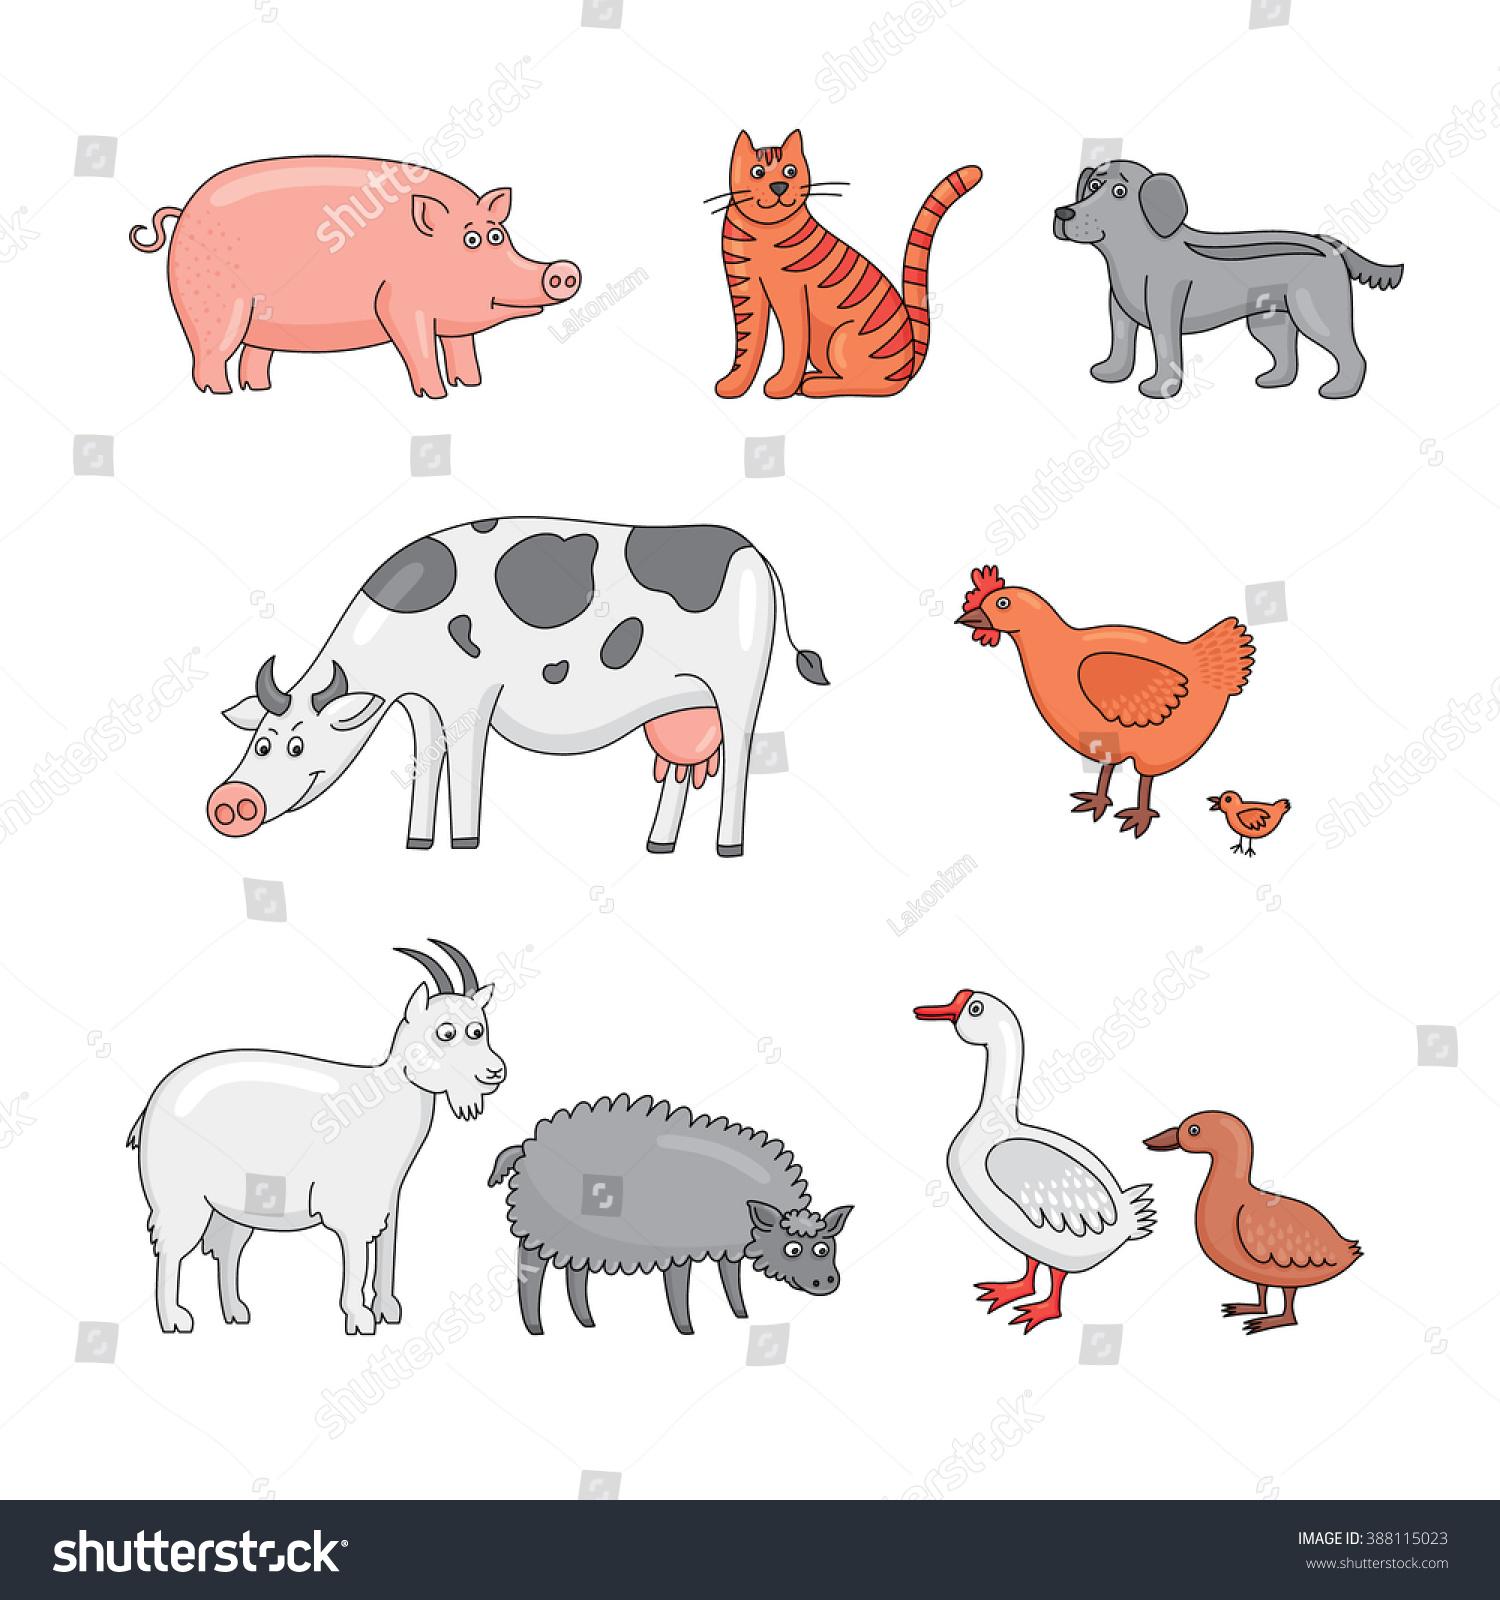 Agri cultures project logo duckdog design - Farm Animals Cow Pig Goat Sheep Cat Dog Duck